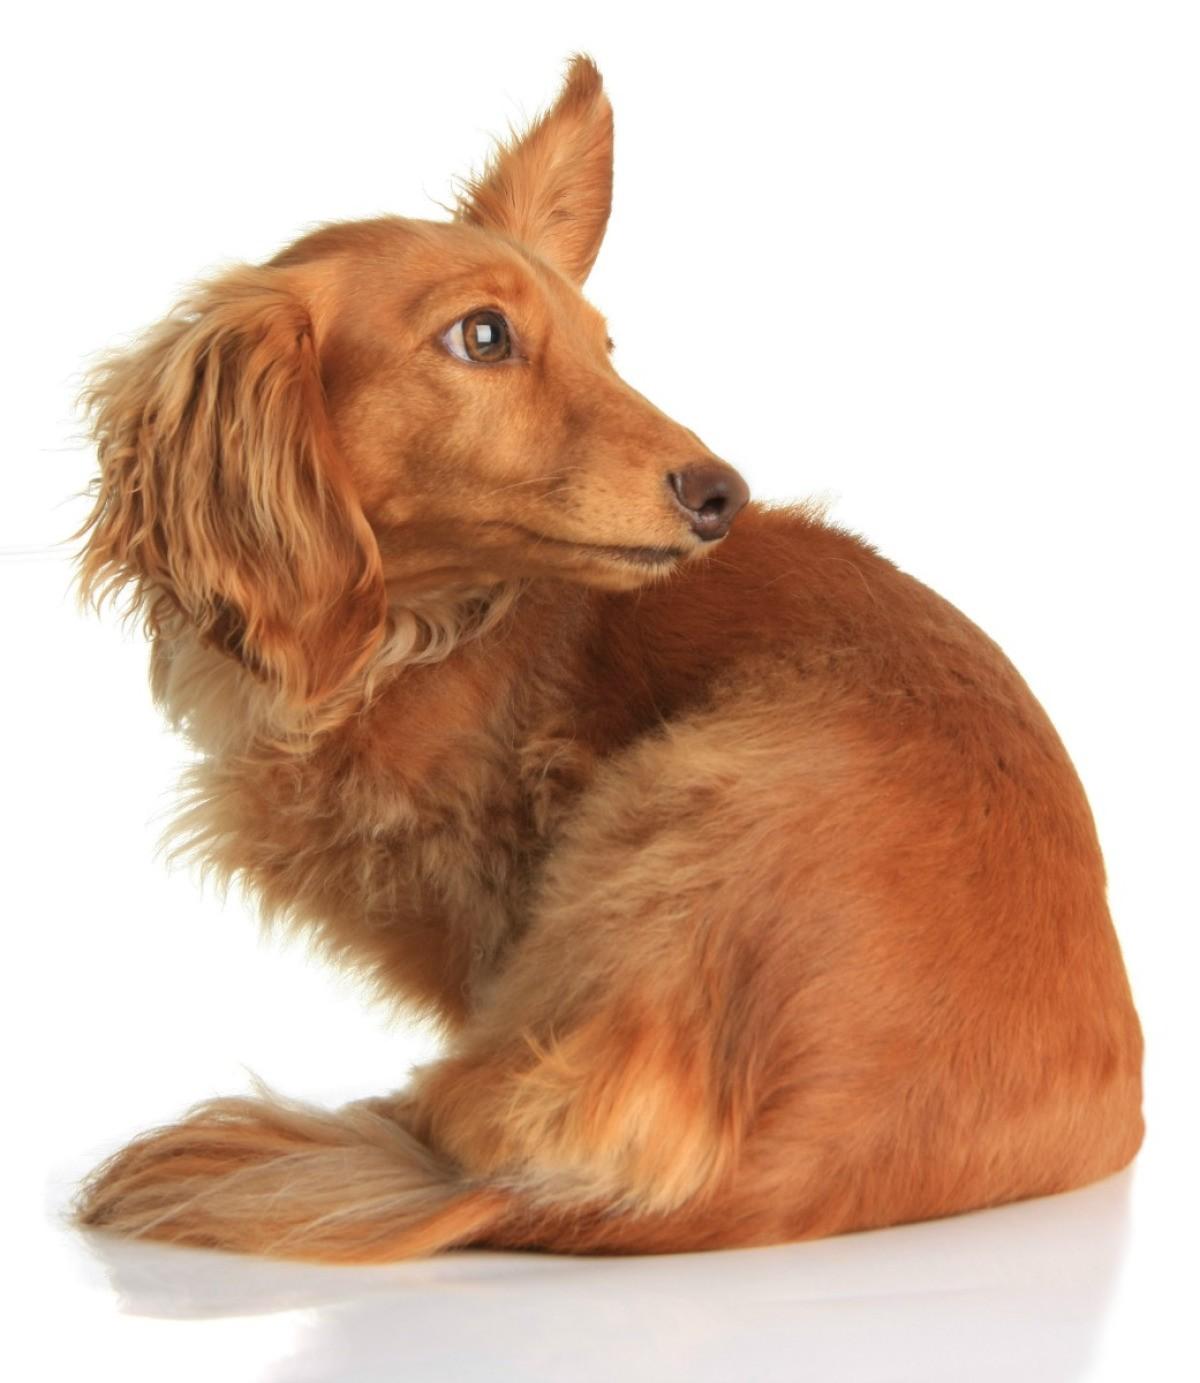 Dog Afraid of Loud Noises | ThriftyFun